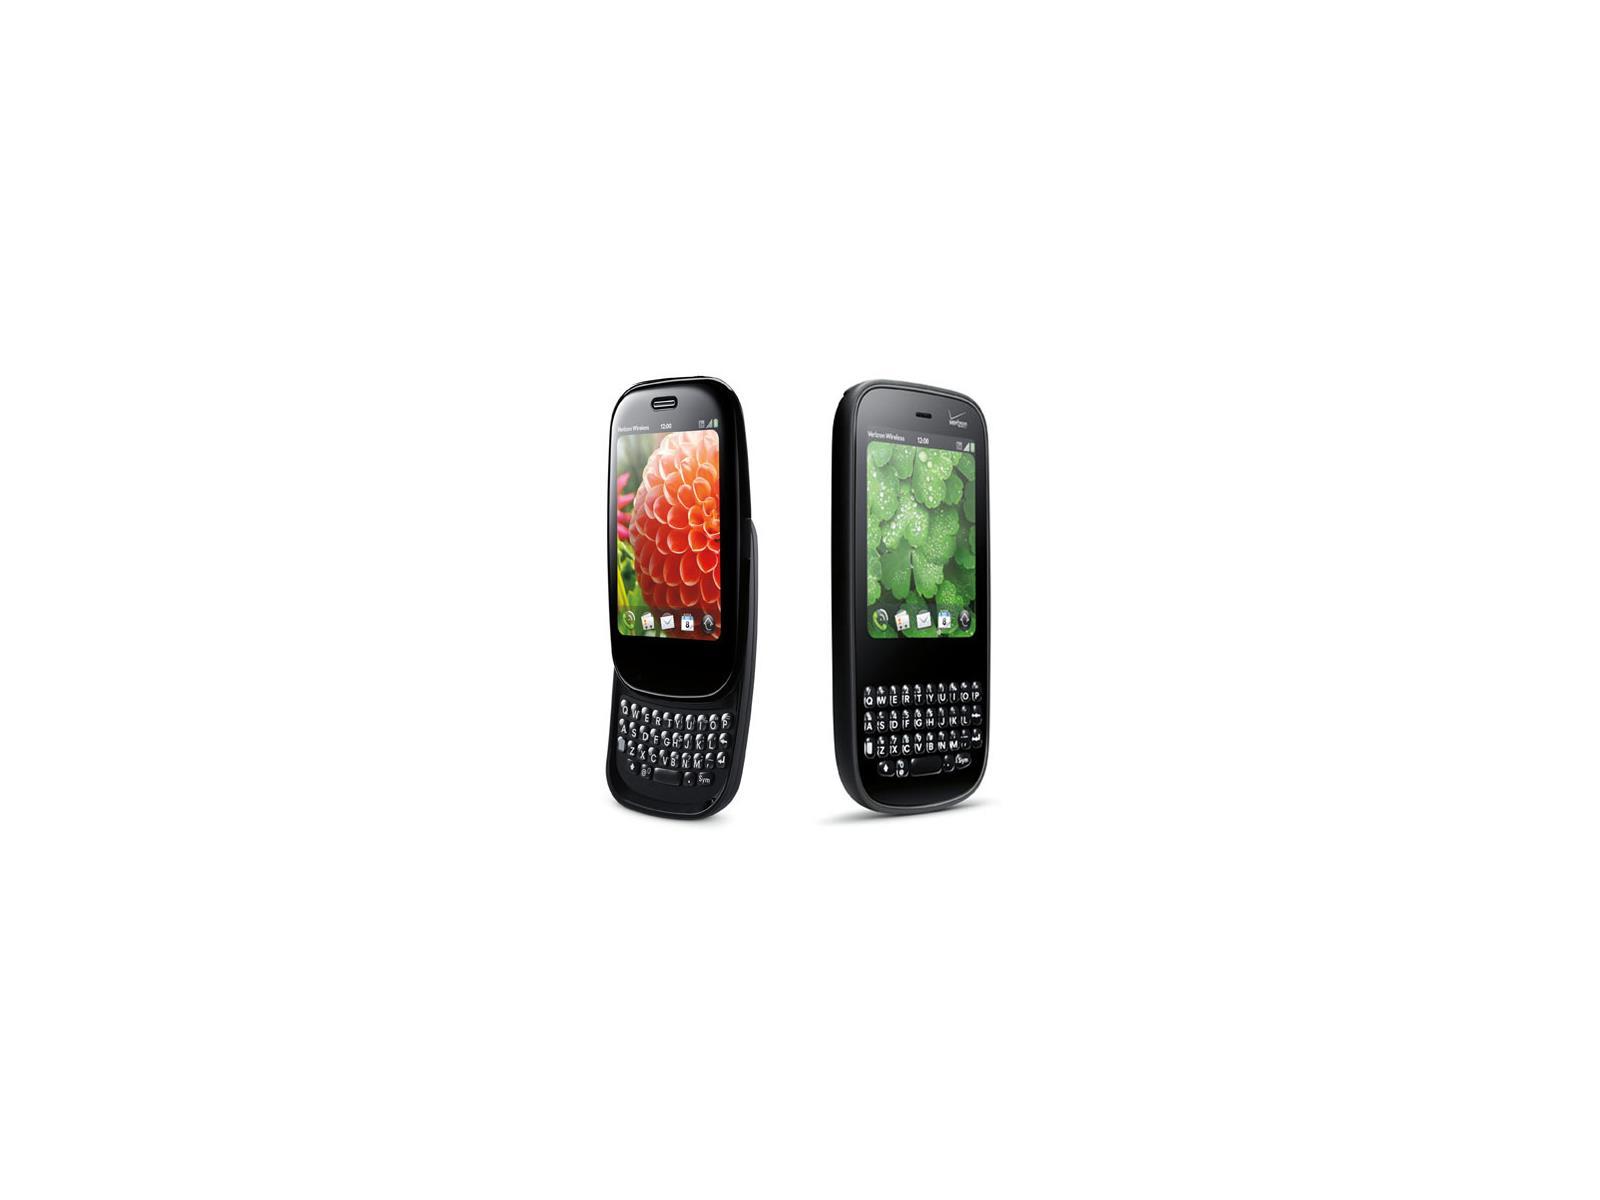 Verizon Wireless Announces Prices For Palm Pixi Plus & Pre Plus